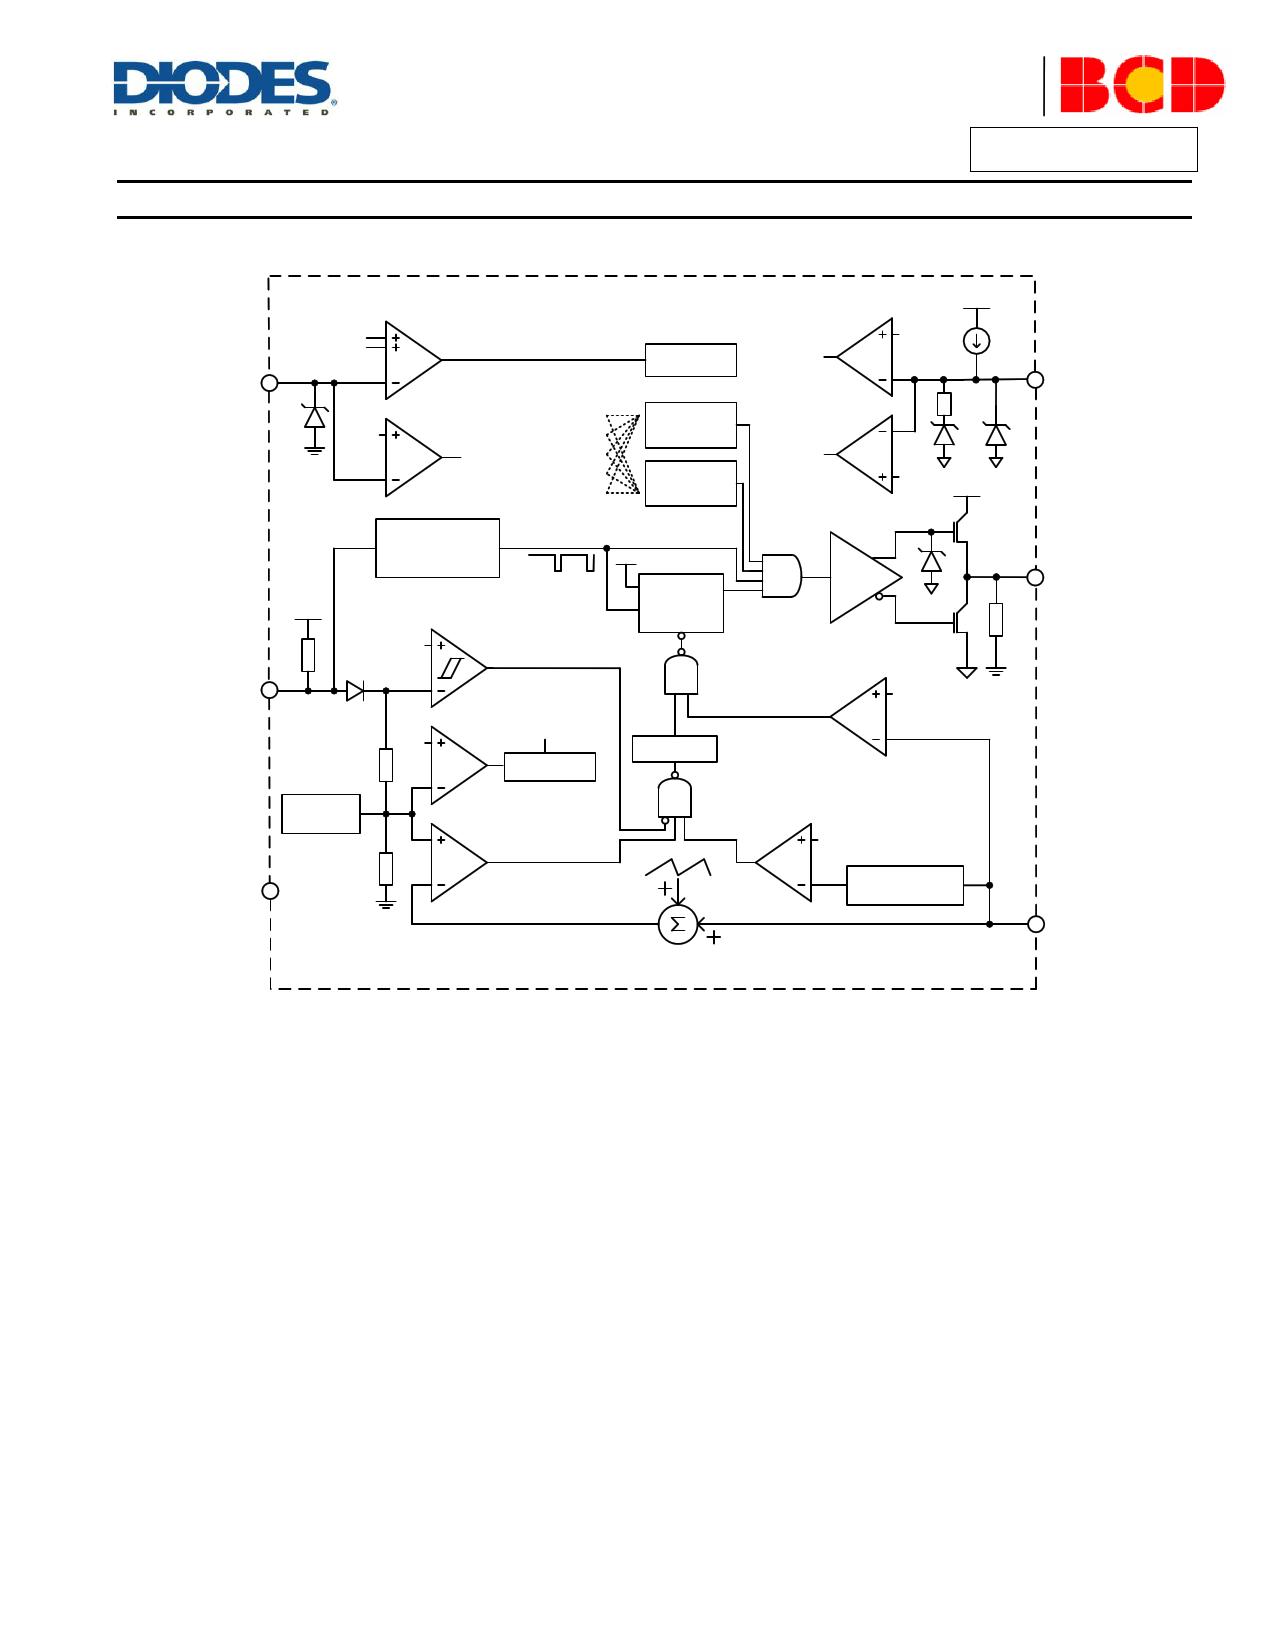 AP3105L pdf, 電子部品, 半導体, ピン配列